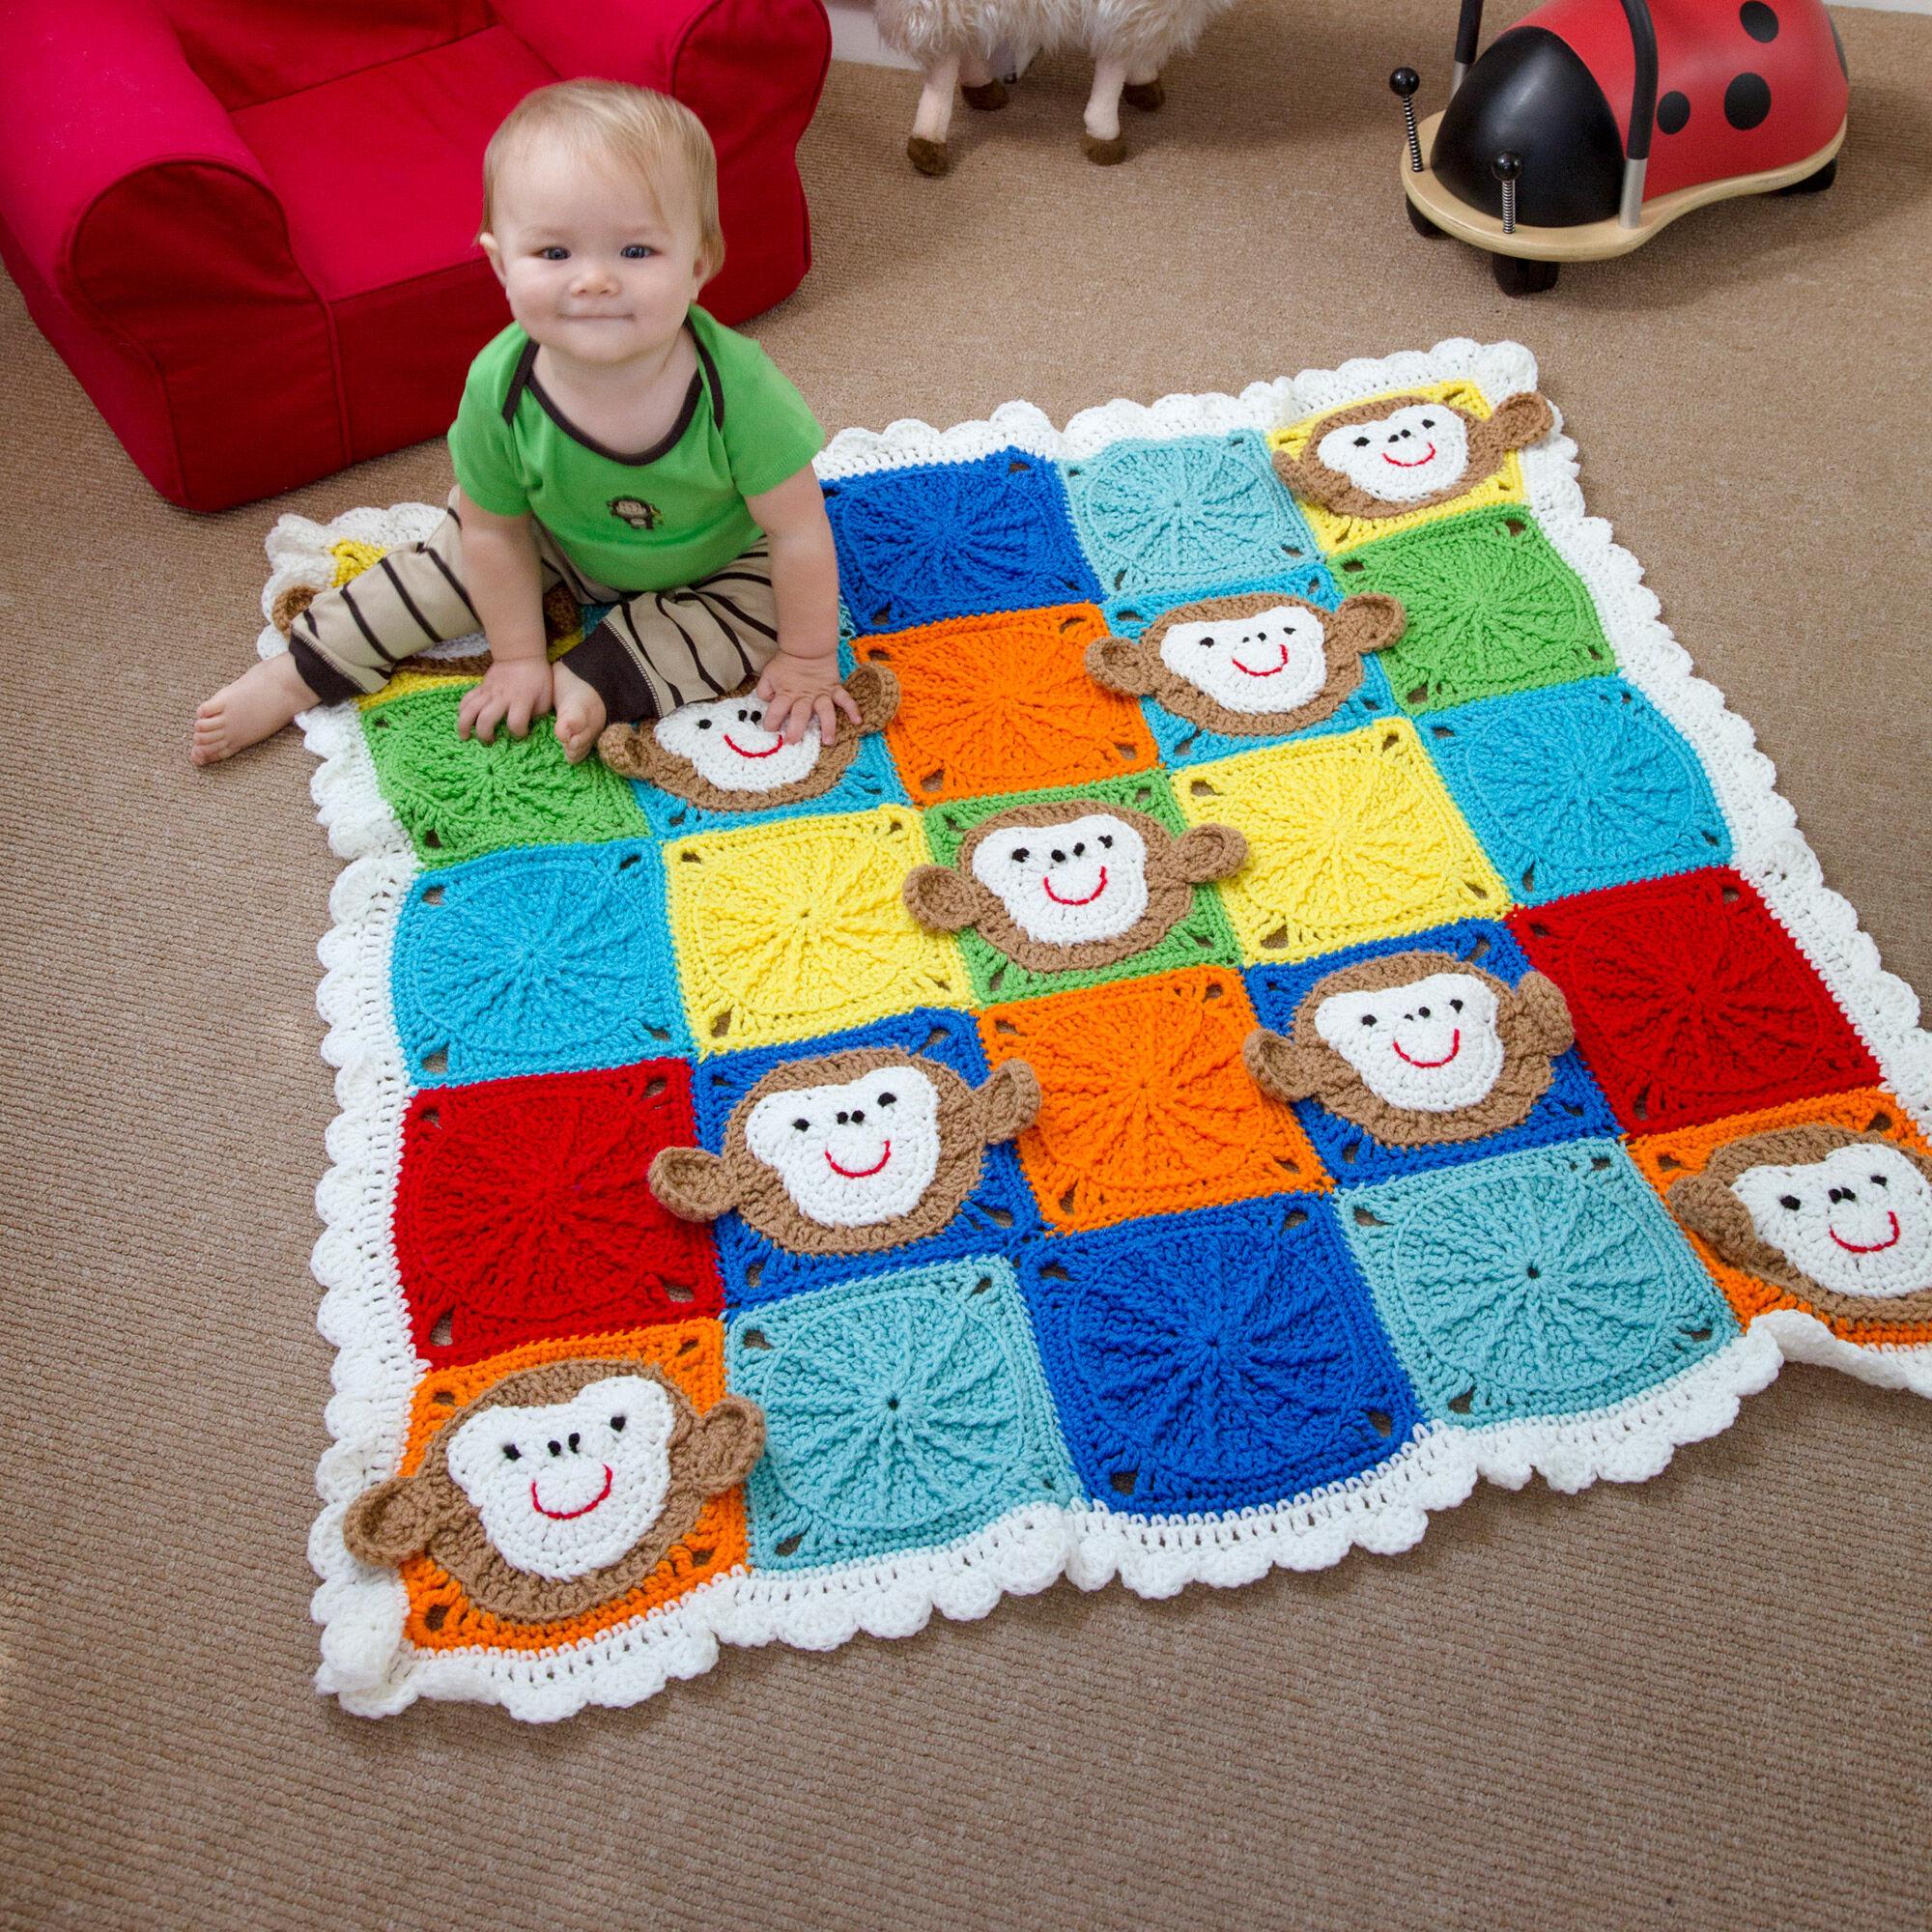 Red Heart Monkey Around Baby Blanket | Yarnspirations